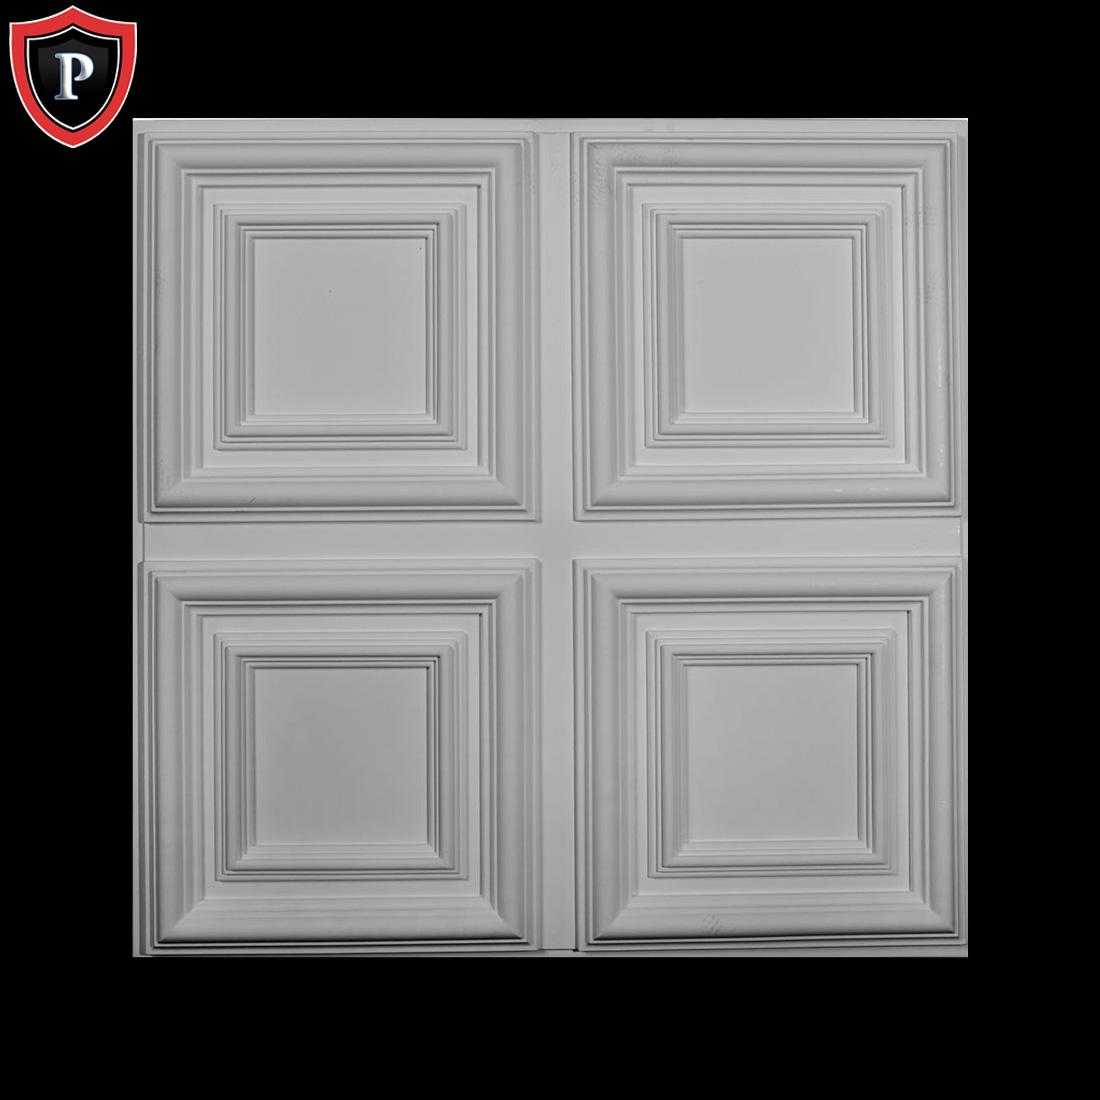 Chadsworth inc offers lightweight economical polyurethane ceiling 23 34w x 23 34h x 1 58p quatro ceiling tile polyurethane material design ct 24 qua py 24 shoplumns dailygadgetfo Image collections